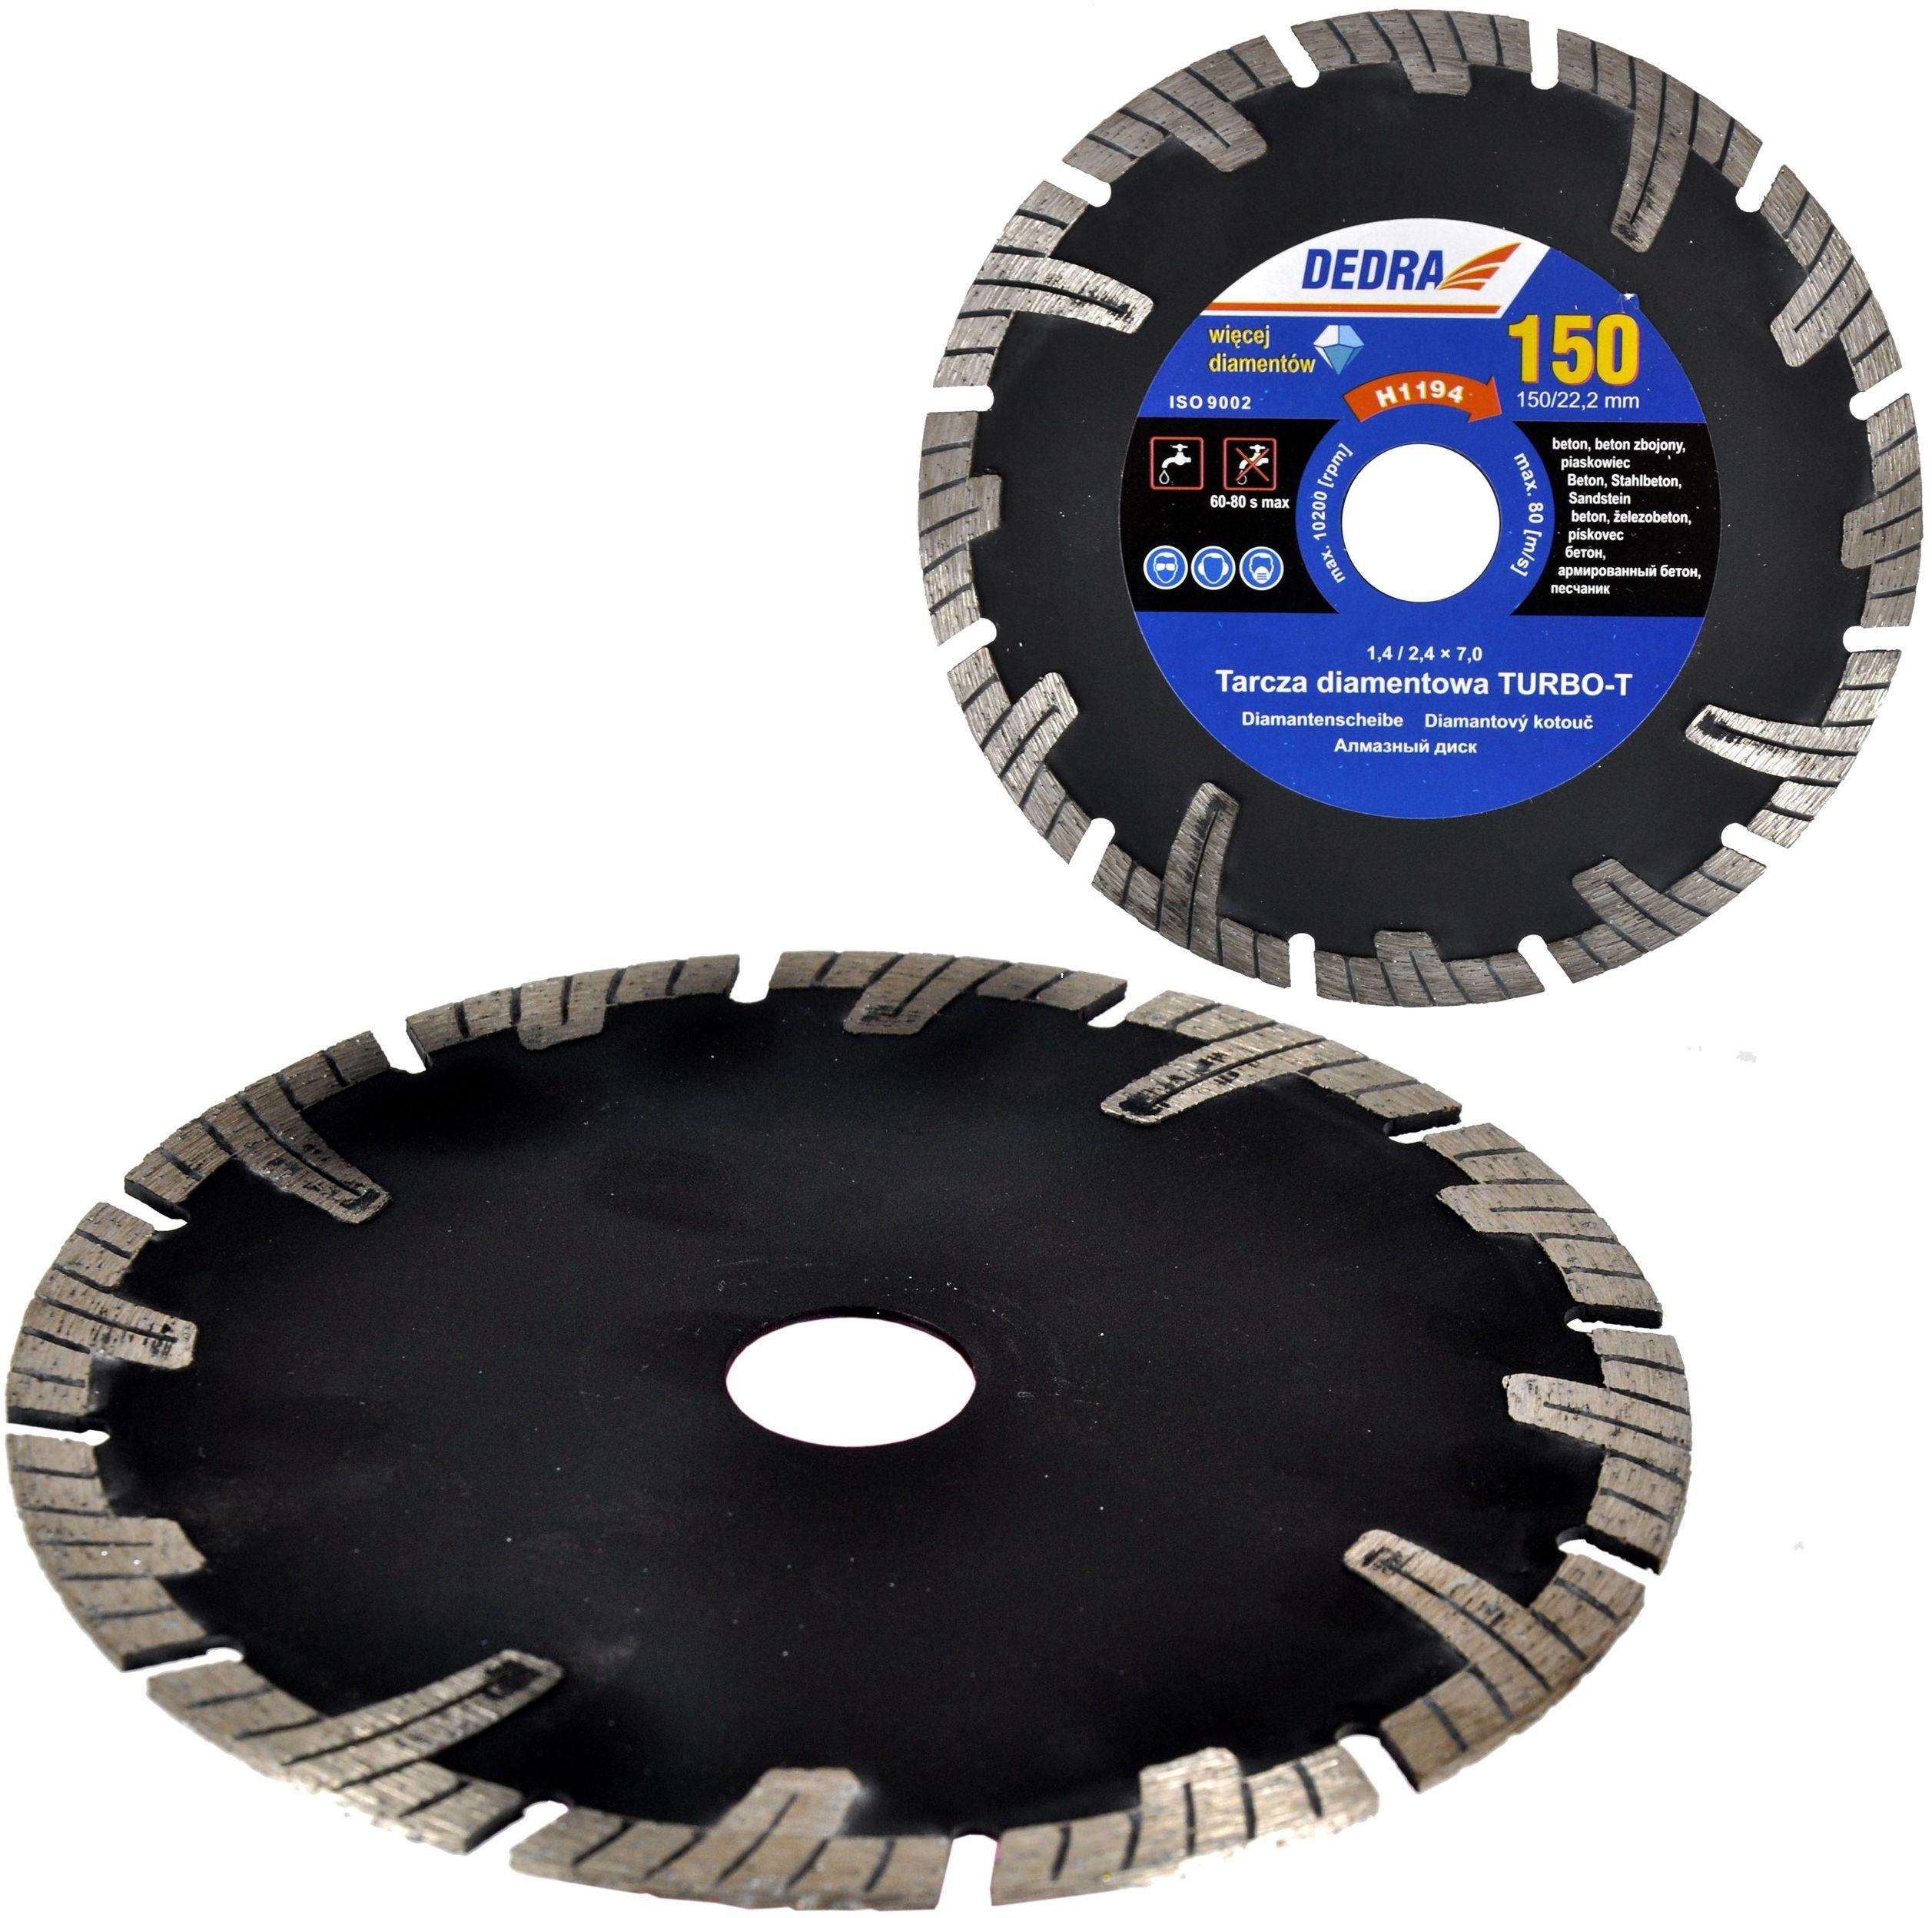 Piła tarczowa tarcza diamentowa 125mm 22,2 betonu